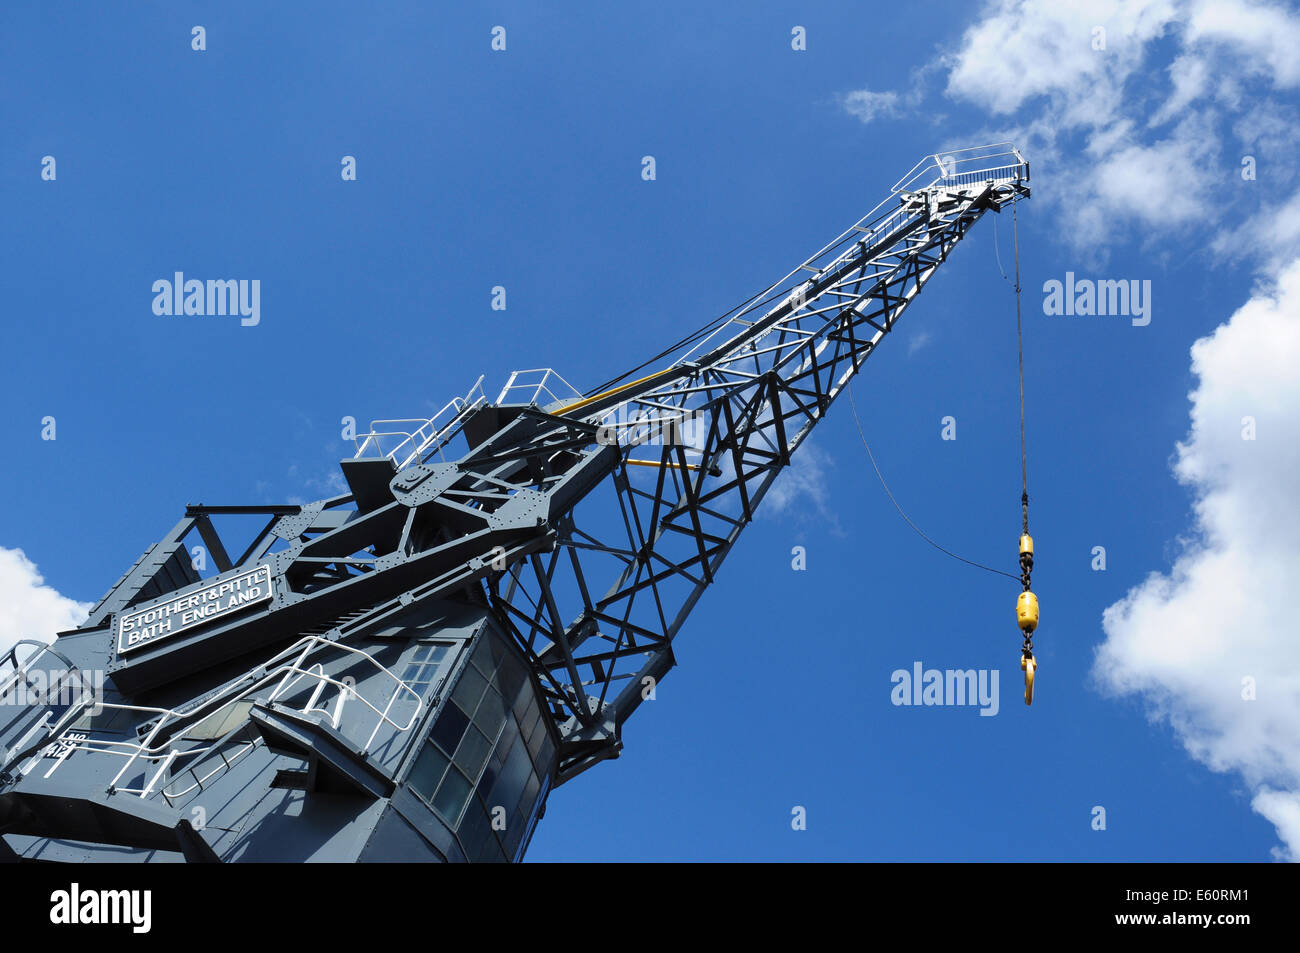 Dockside Crane, Chatham Historic Dockyard, Kent, England, UK - Stock Image